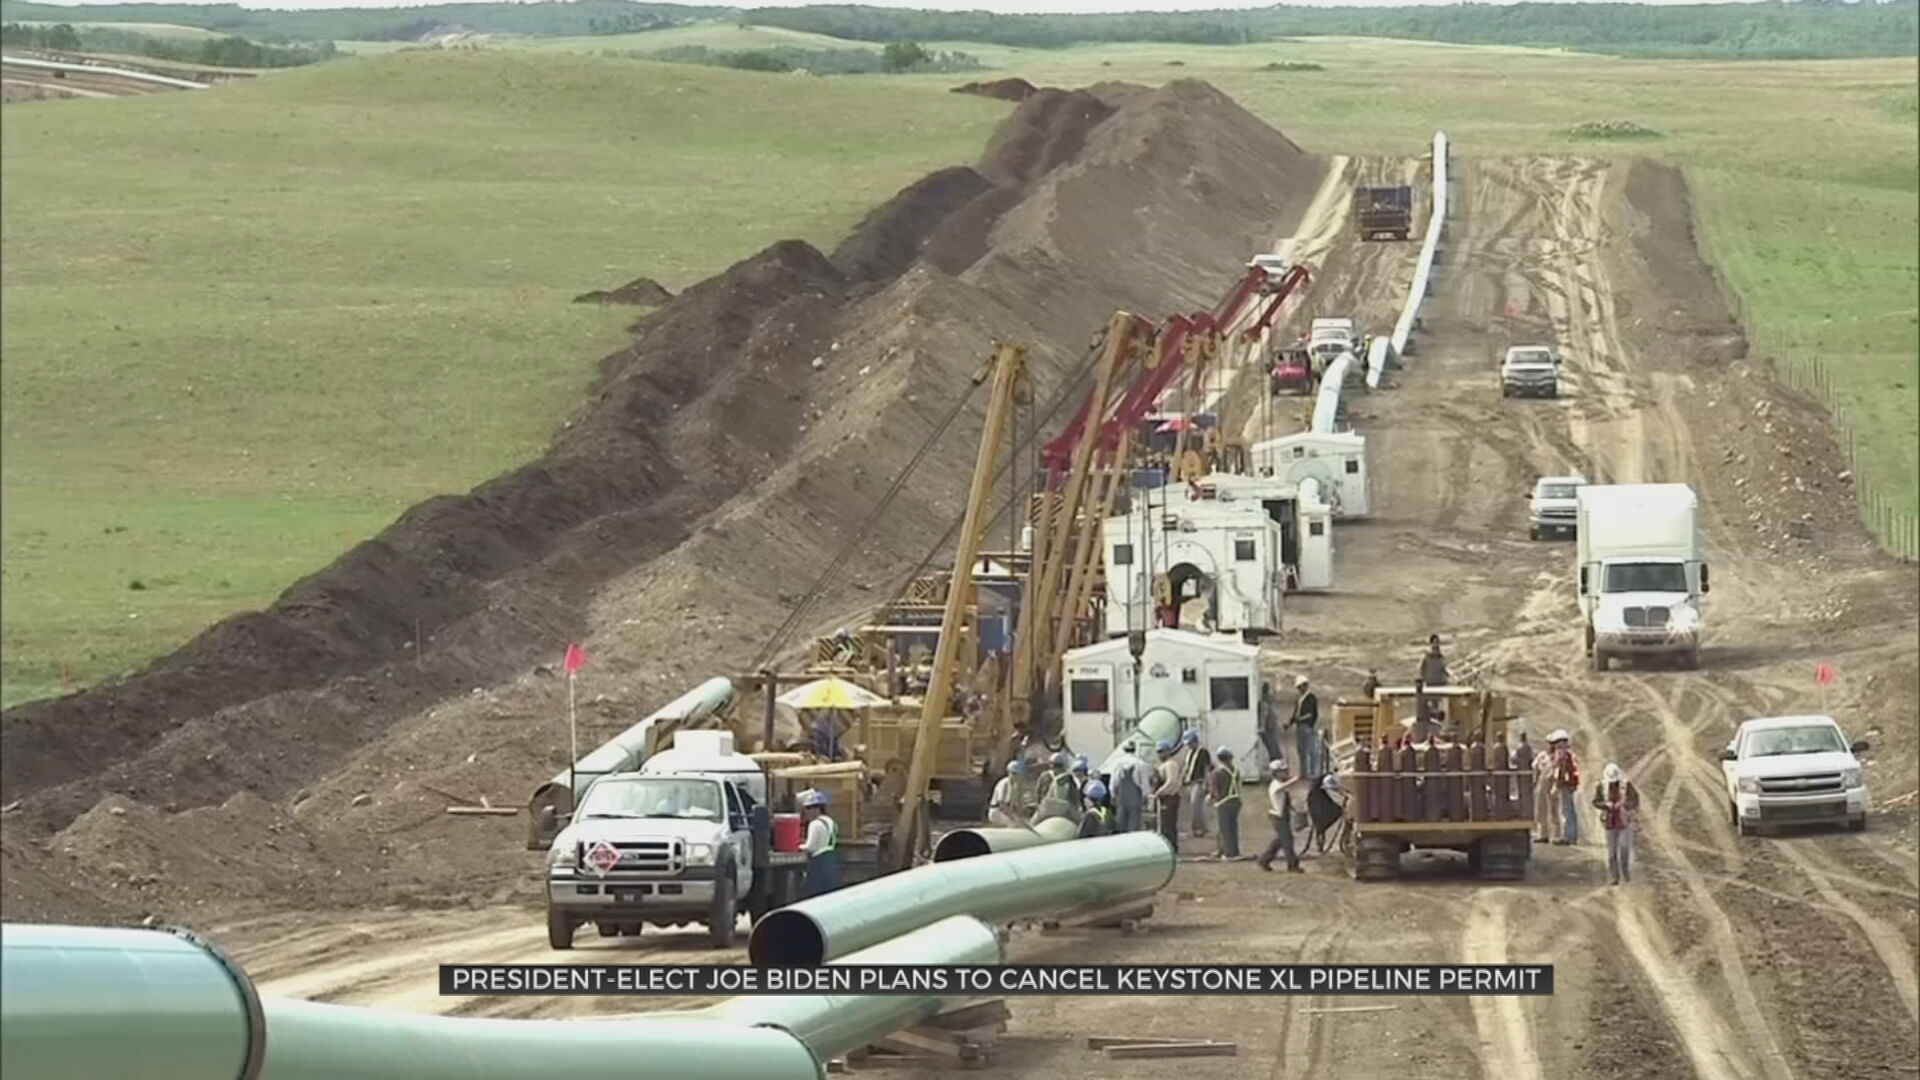 TU Professor, Cherokee Nation Weigh In On Possibility Biden Cancels Keystone XL Pipeline Permit